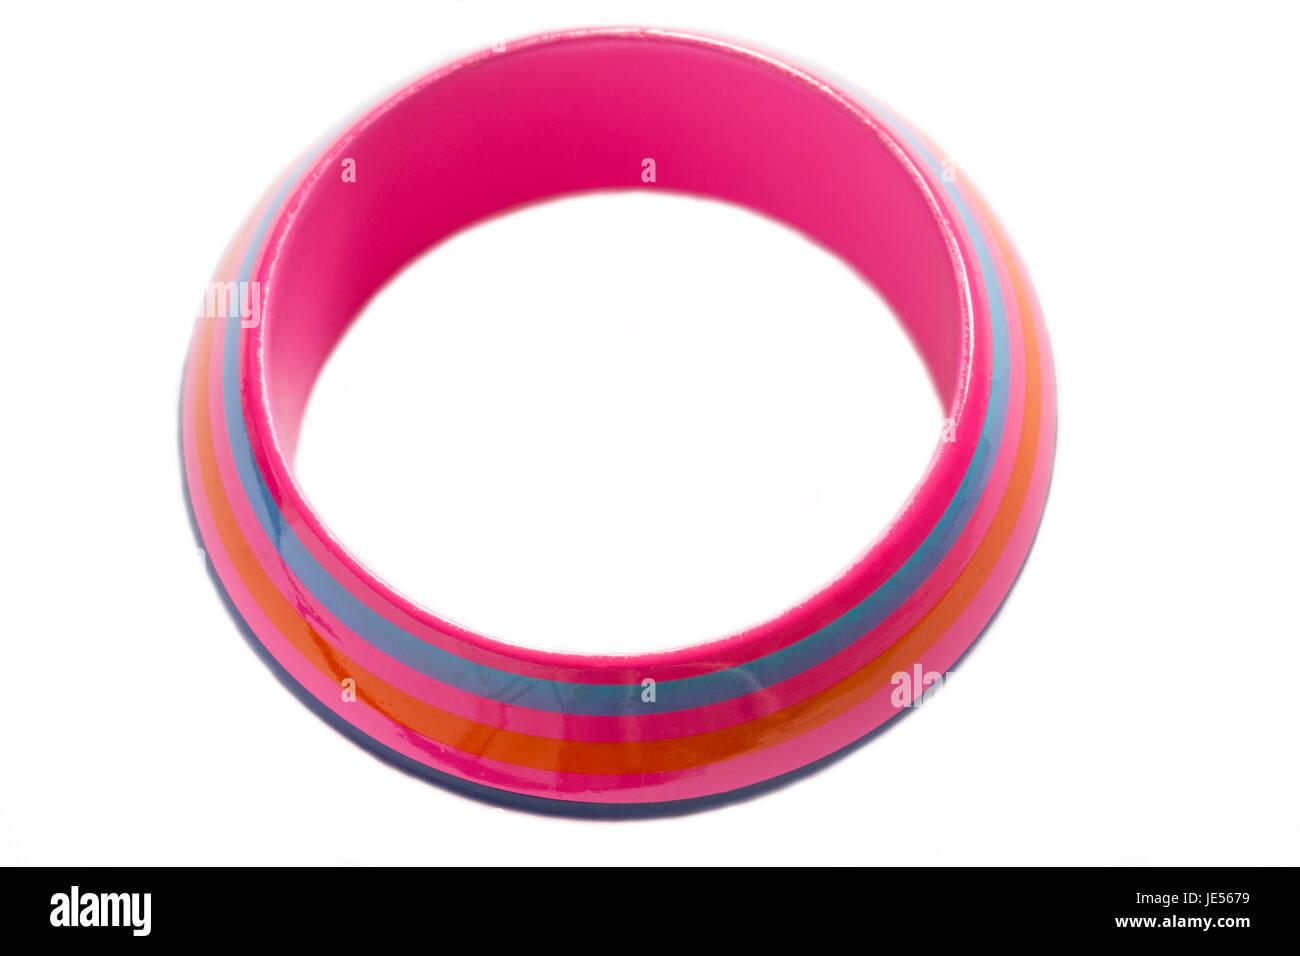 Pink bangle with orange and blue stripes isolated on white background - Stock Image